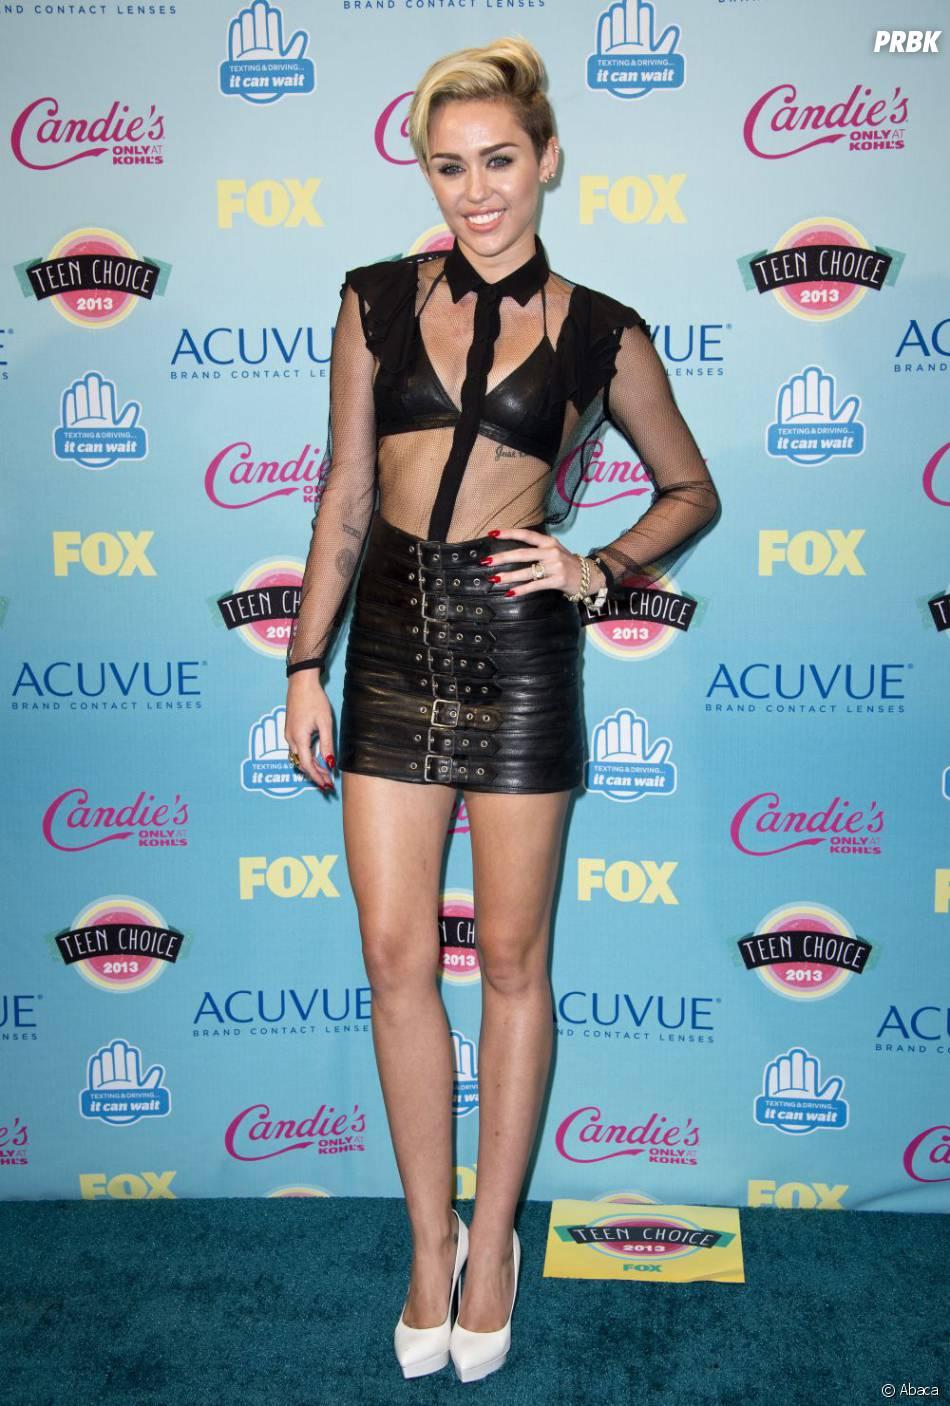 Miley Cyrus transparente aux Teen Choice Awards 2013